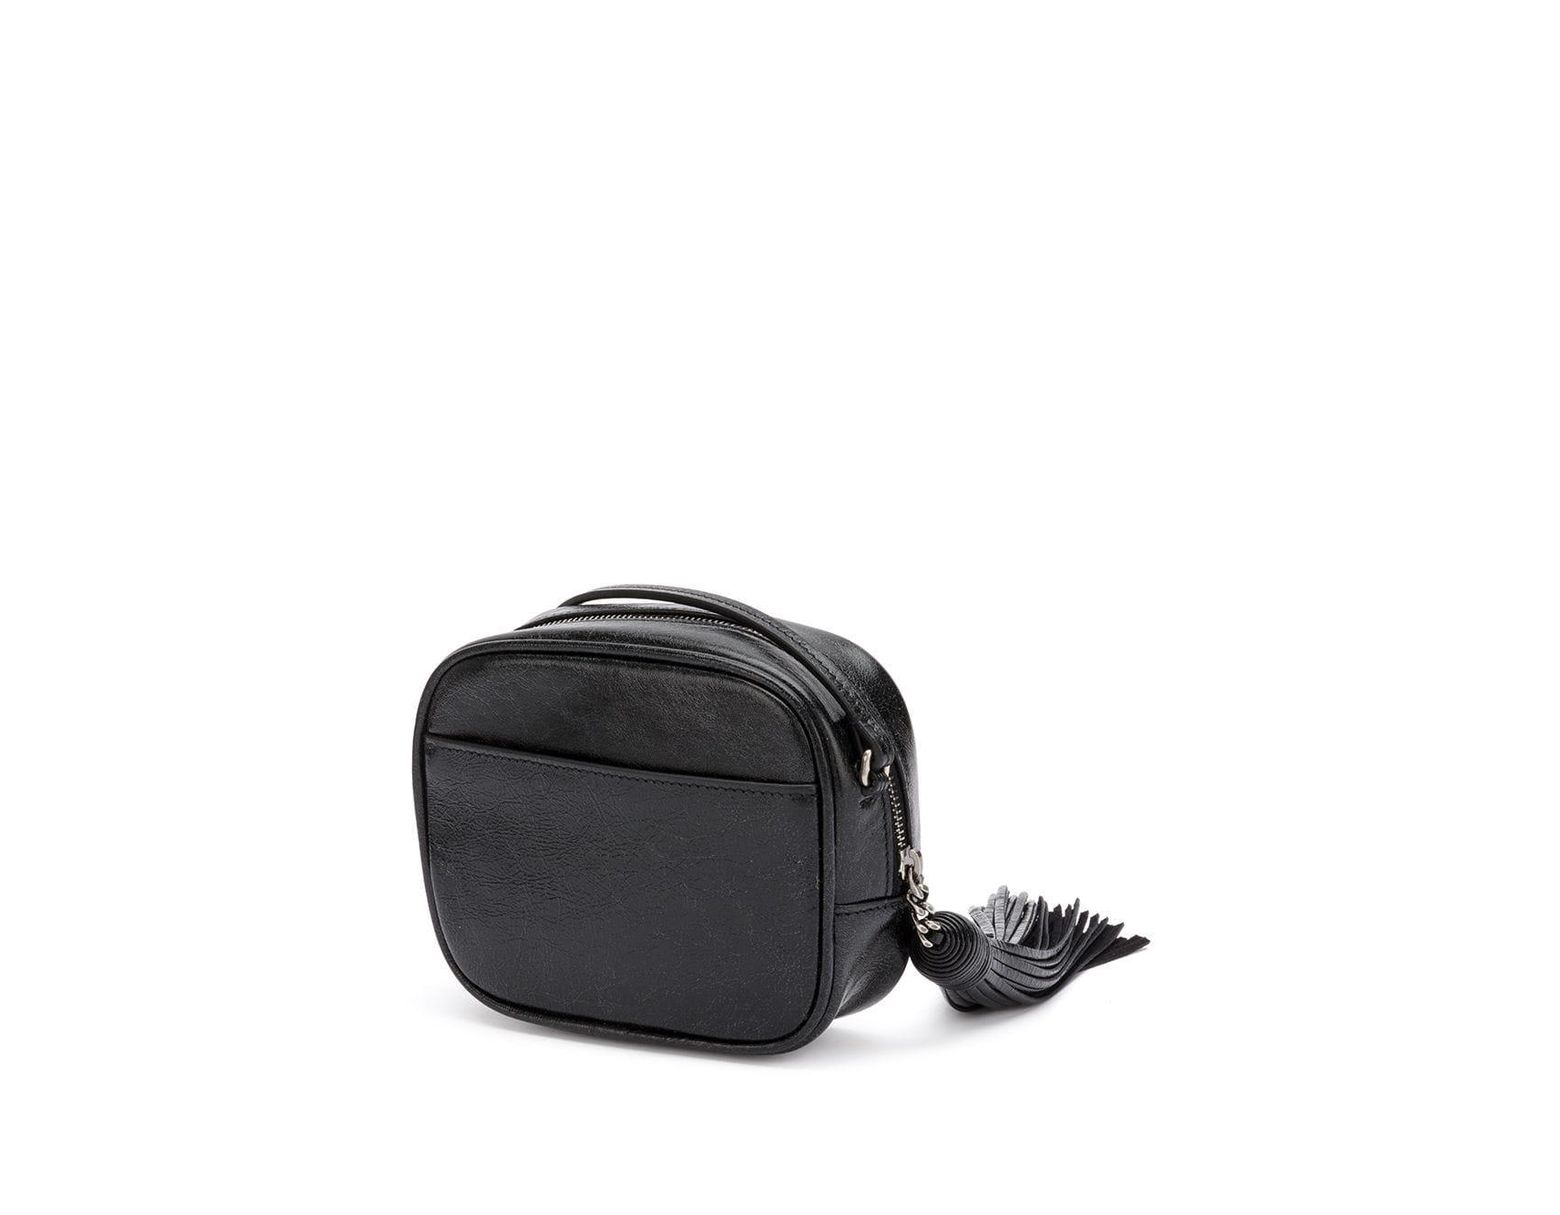 563dbd0efc7 Saint Laurent Blogger Star Crossbody Bag in Black - Lyst